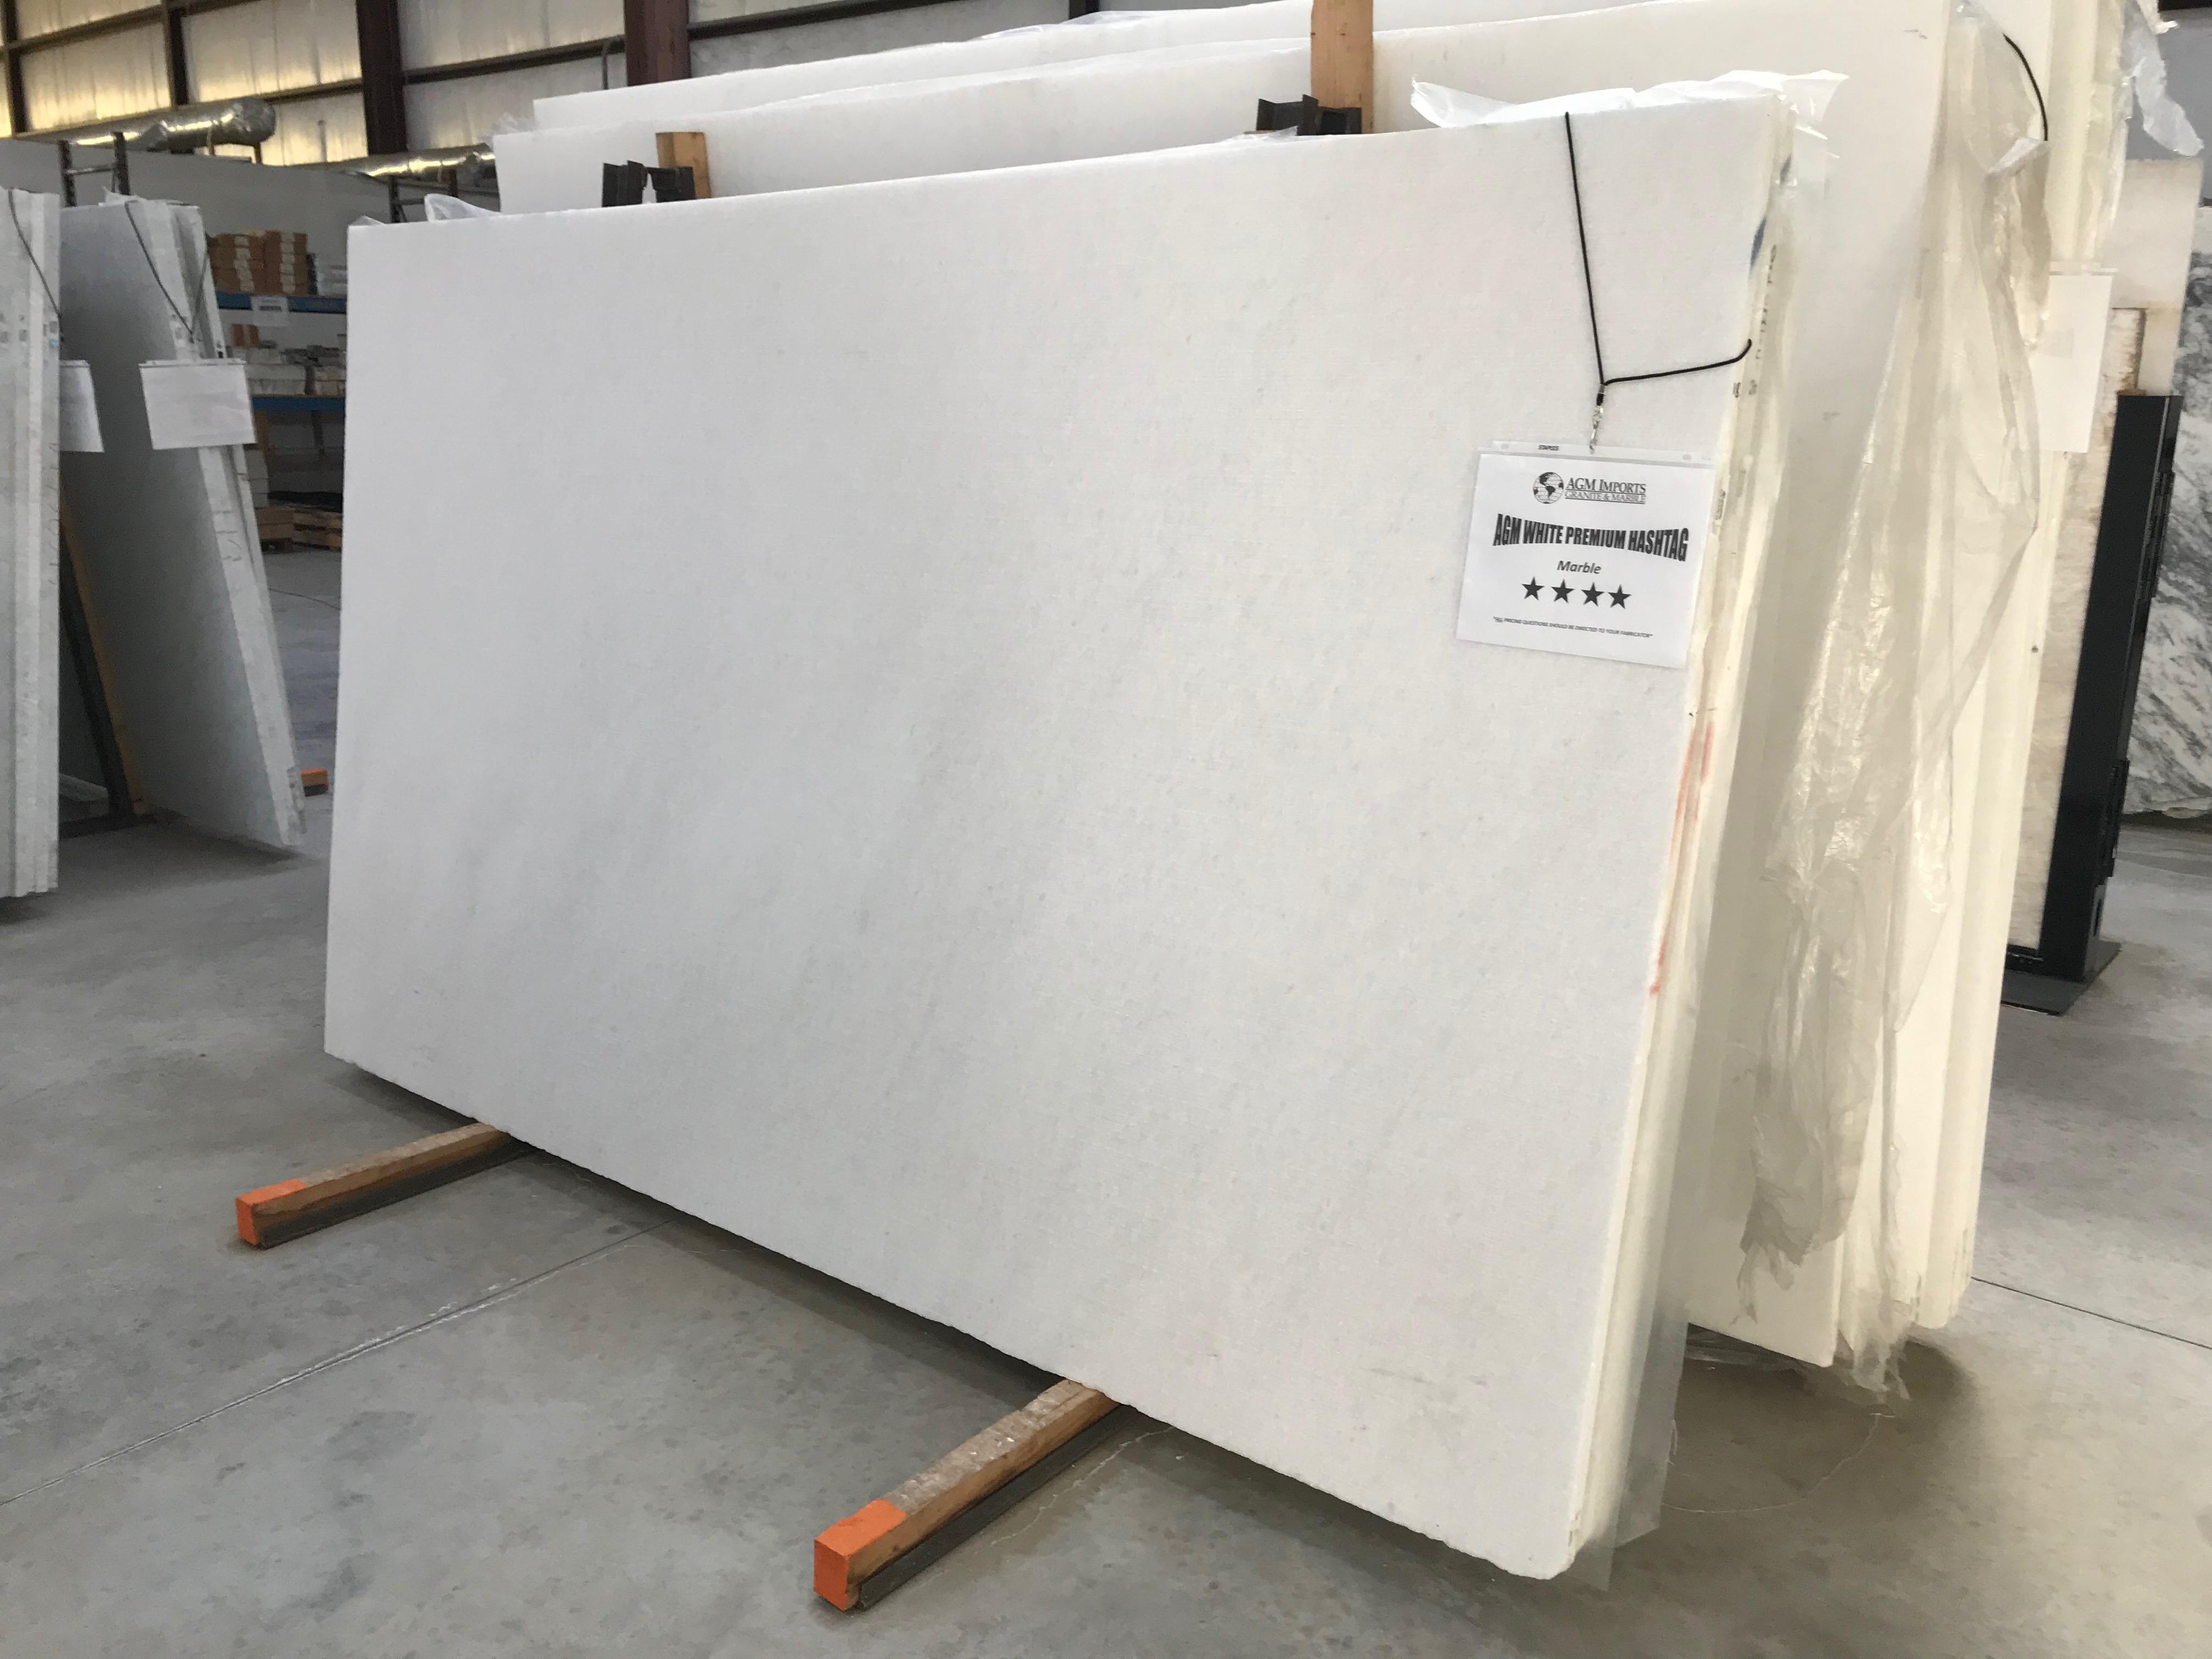 "Product Name: AGM WHITE PREMIUM HASHTAG 3CMLot #: MARM3489 Avg. size: 108"" X 65"""